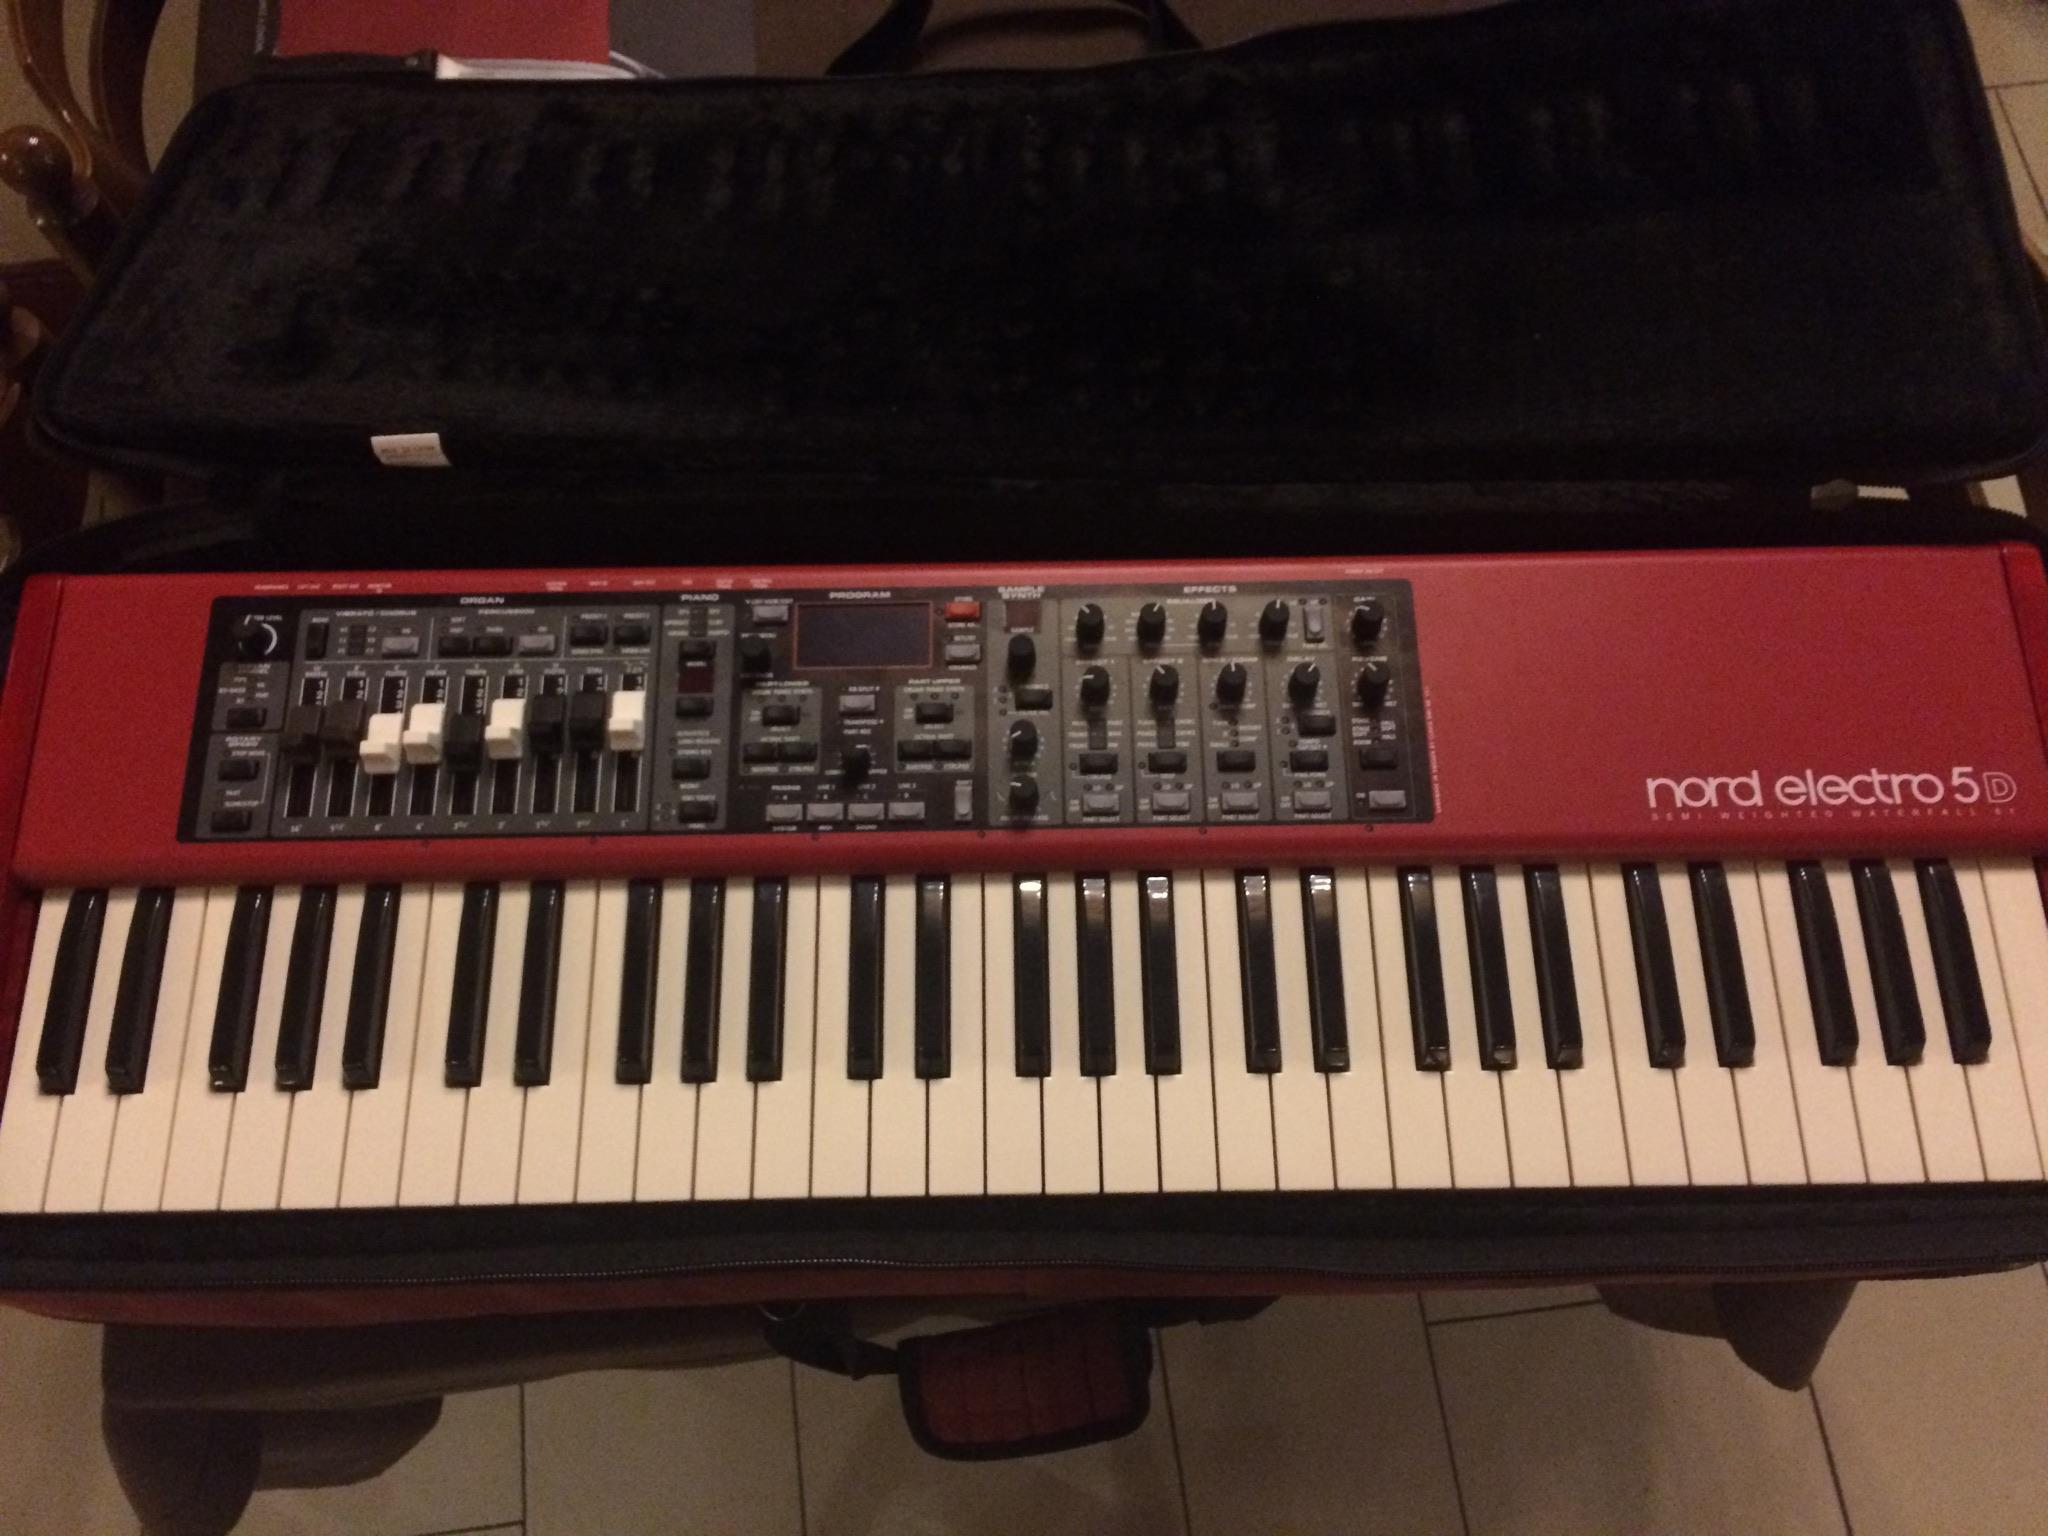 nord electro 5d 61 manual